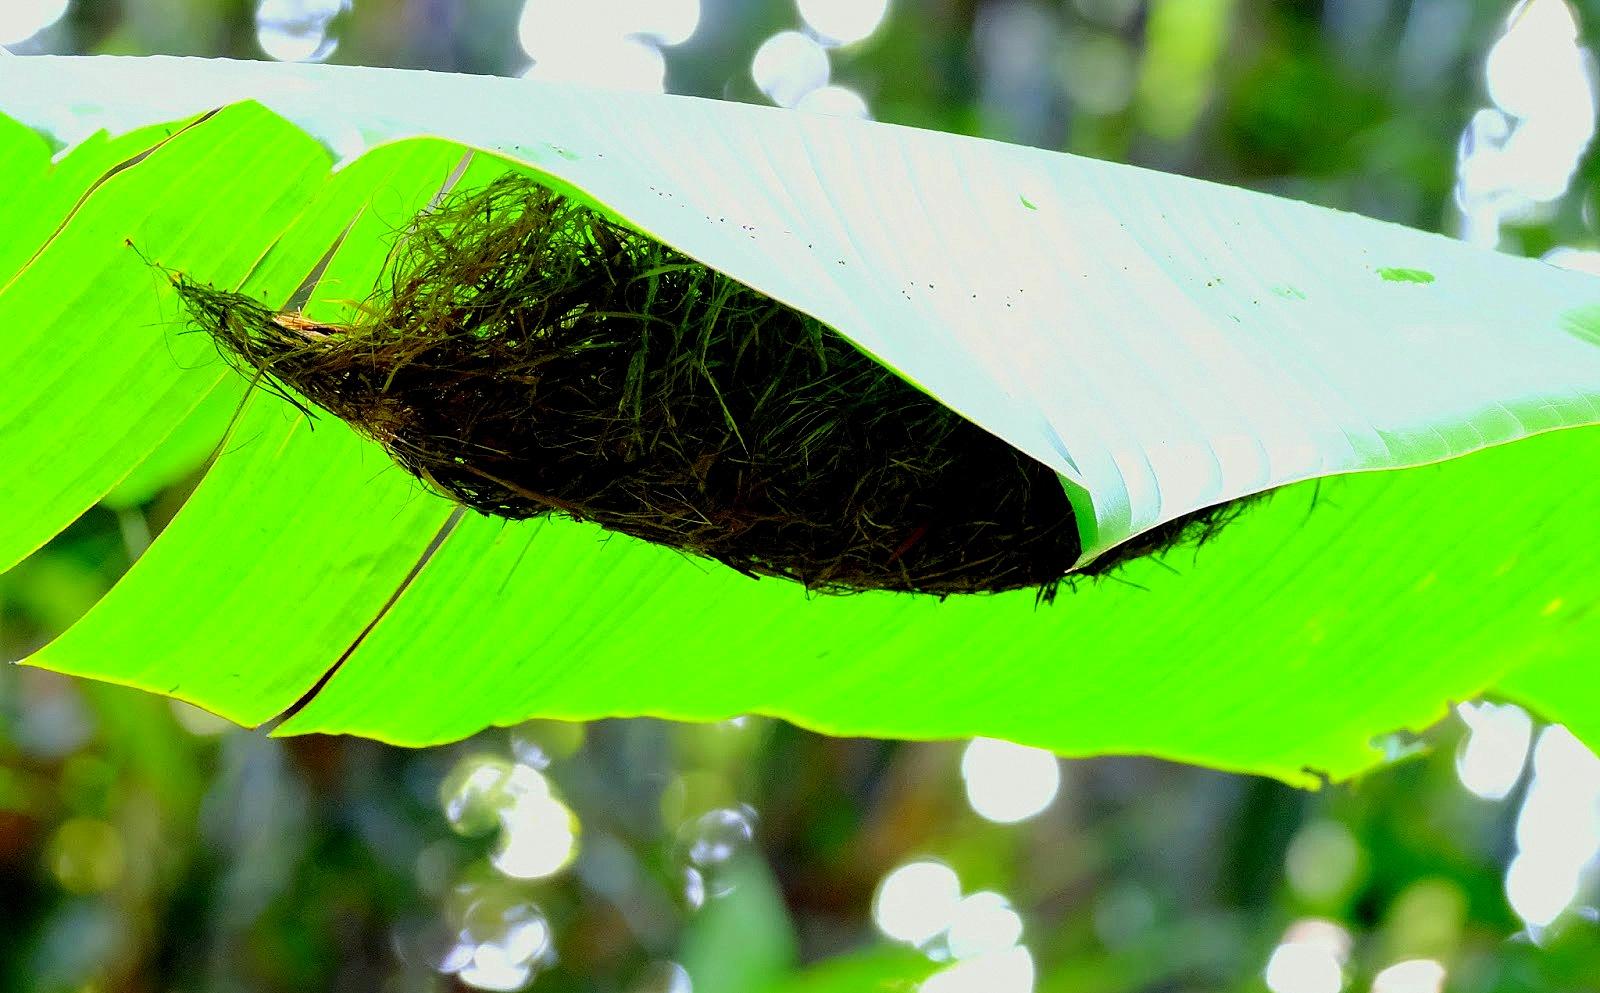 Tổ chim Long-billed Spiderhunter